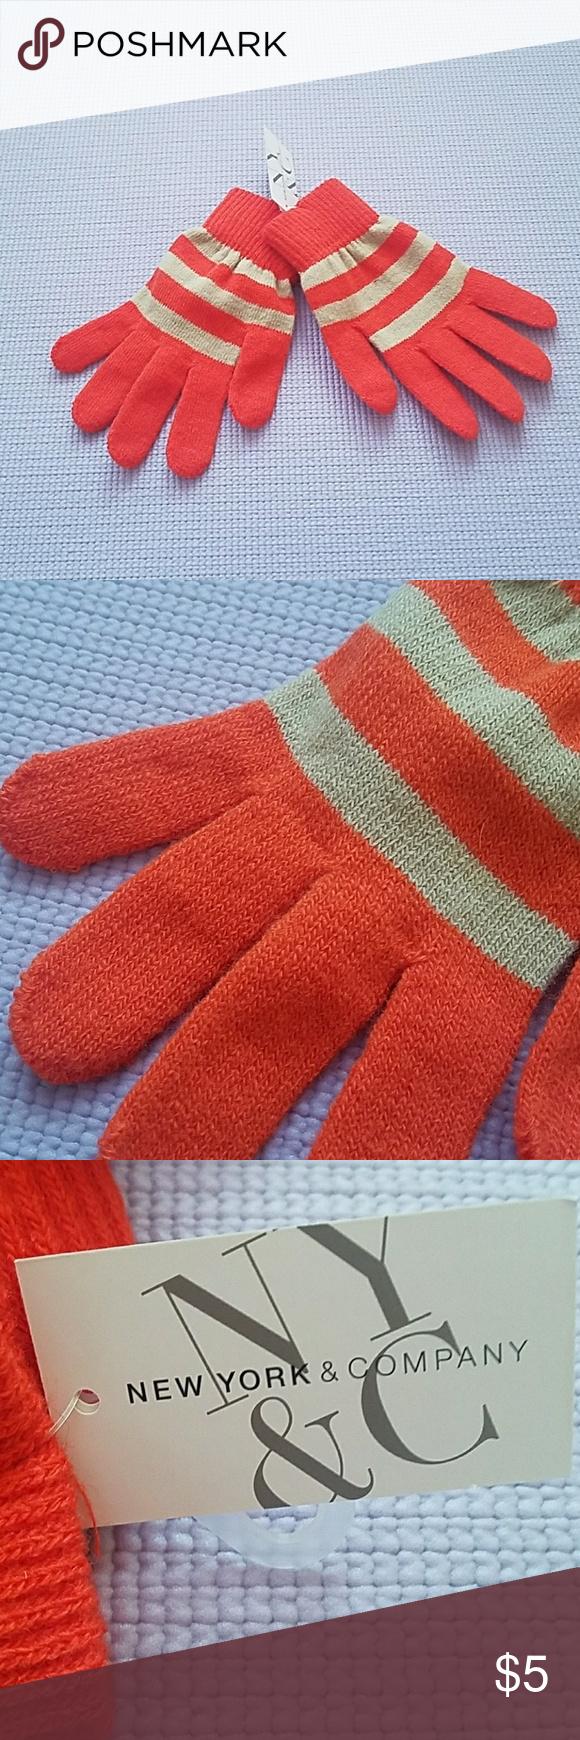 Orange and tan gloves Orange and tan gloves New York & Company Accessories